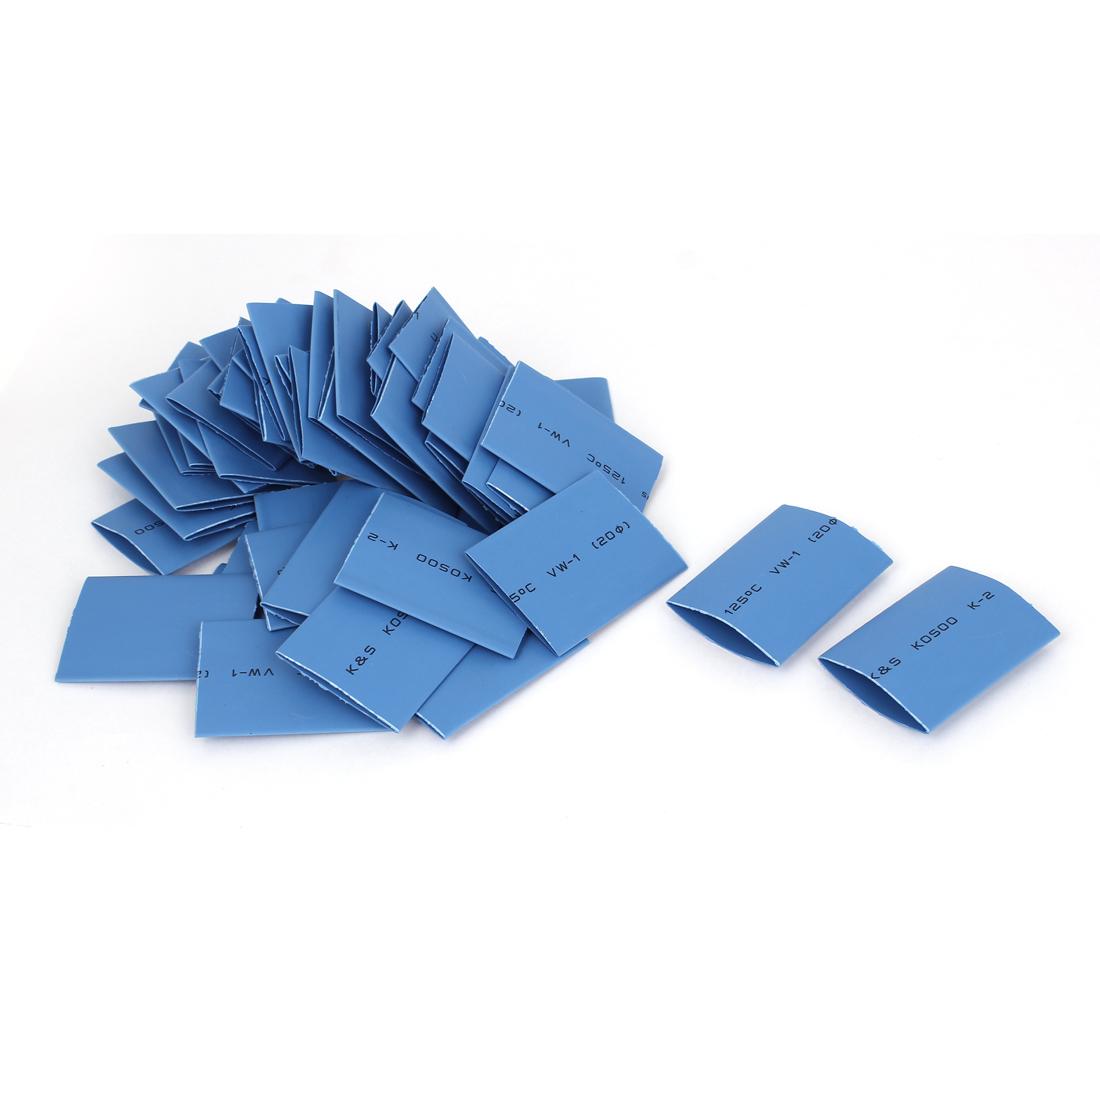 50pcs Blue 20mm Dia 2:1 Polyolefin Heat Shrink Tubing Shrinkable Tube 45mm